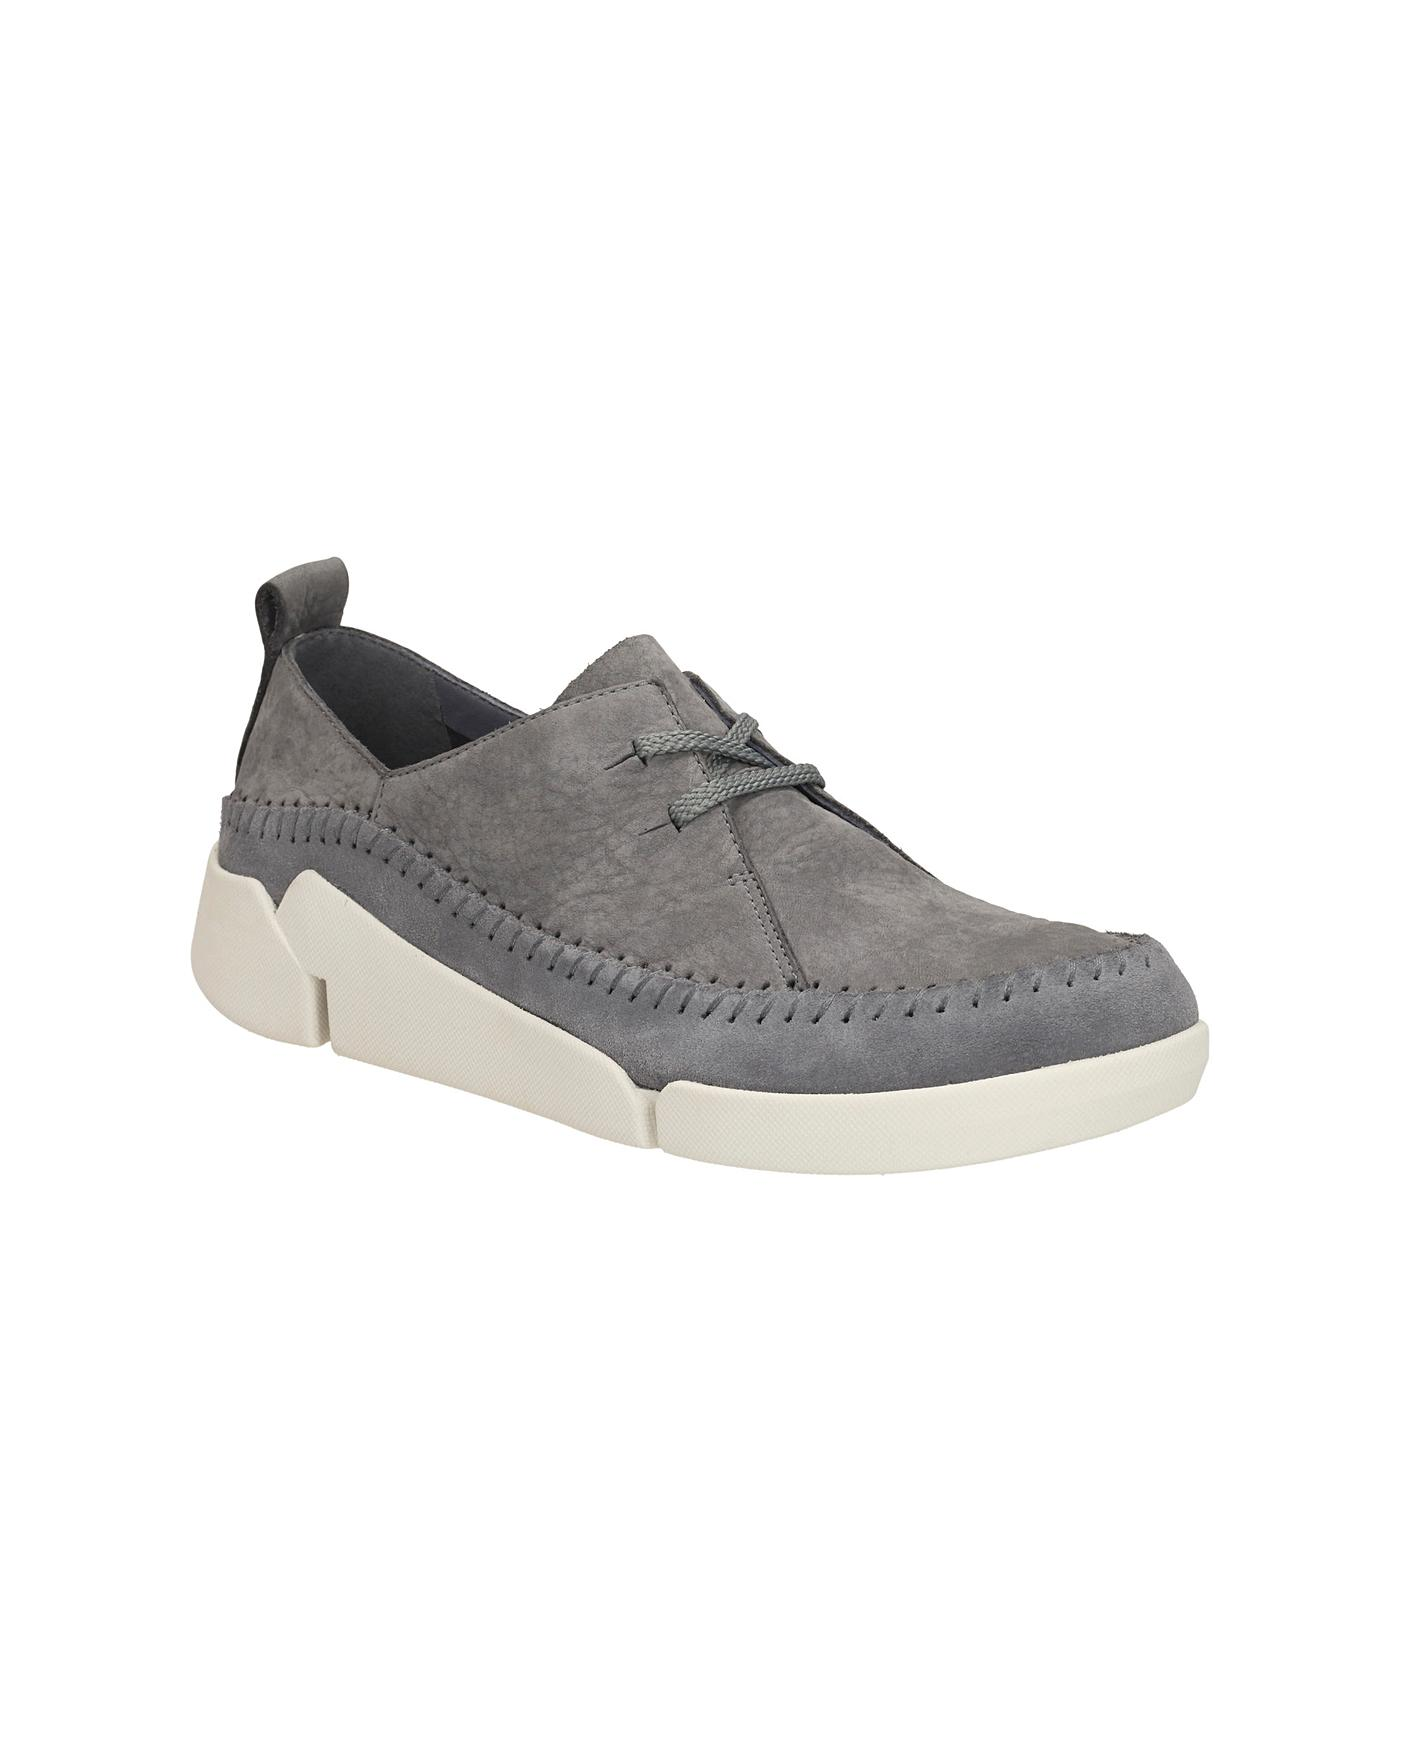 e6c463d66ae Clarks Tri Angel Shoes